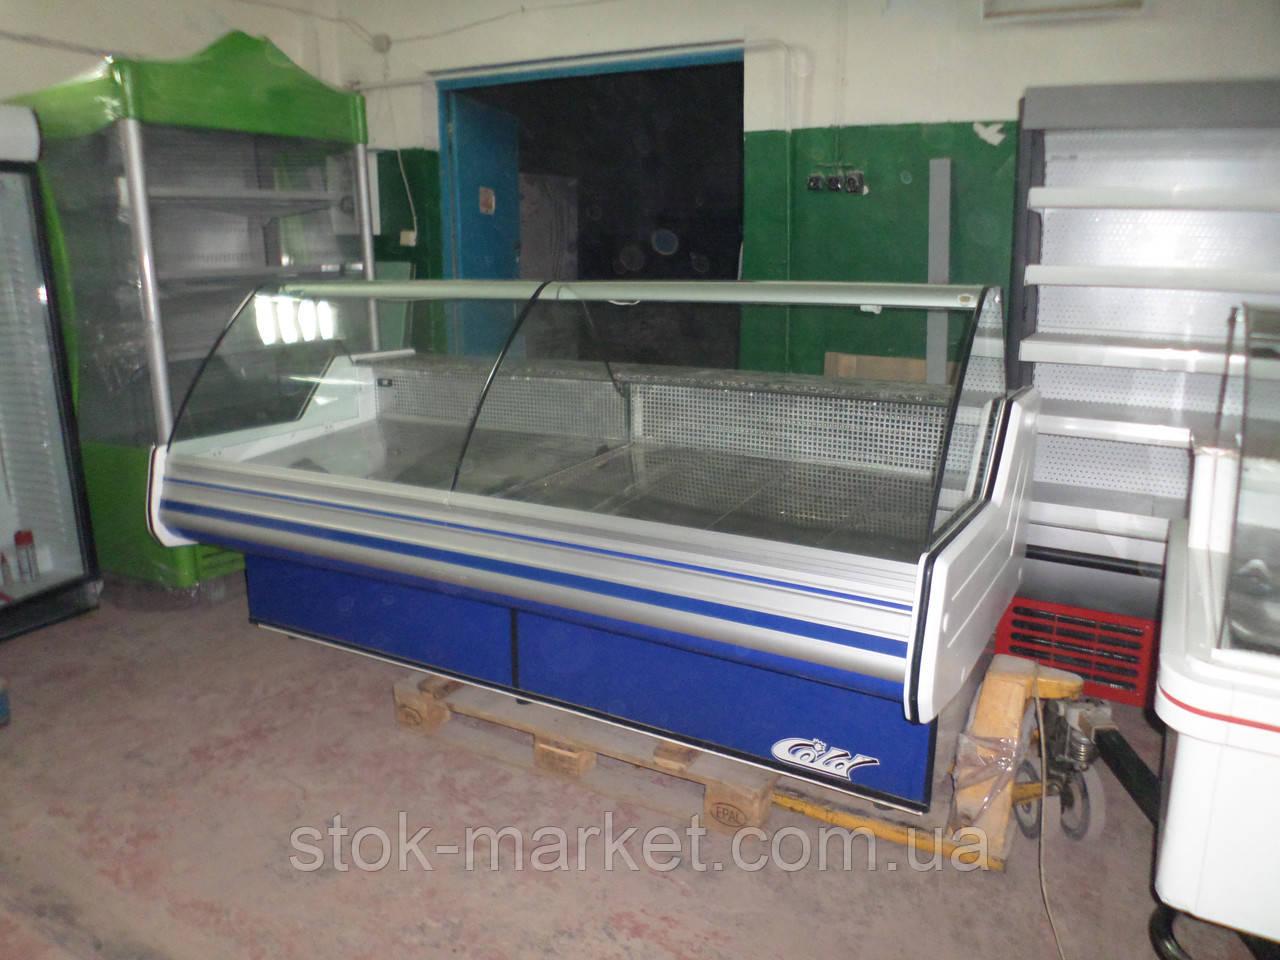 Холодильная витрина Cold W-24 N б/у, холодильная витрина б у, холодильный прилавок б у, витрина гастрономическ